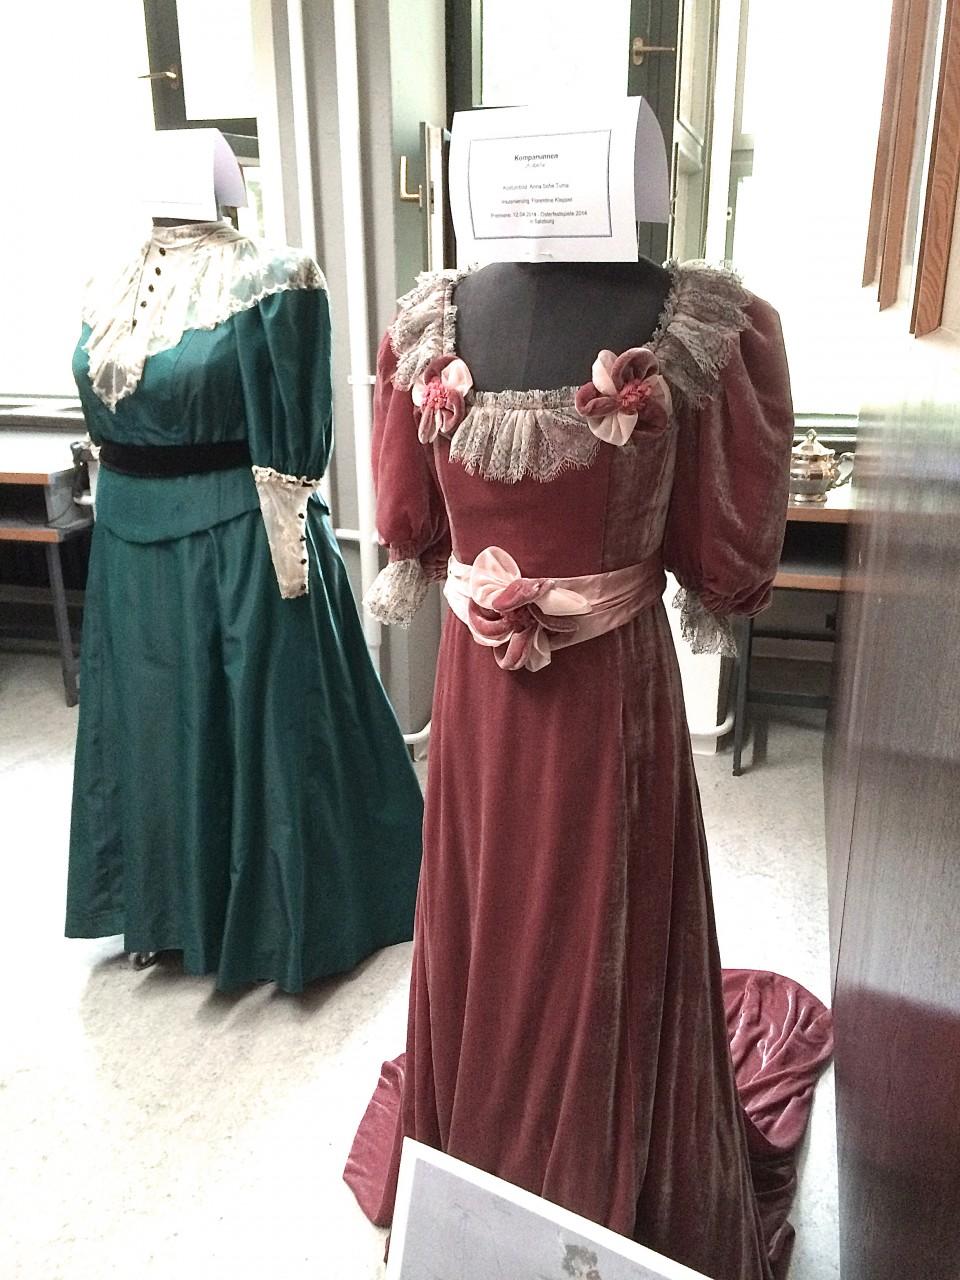 Costume Department, ©HorstundEdeltraut